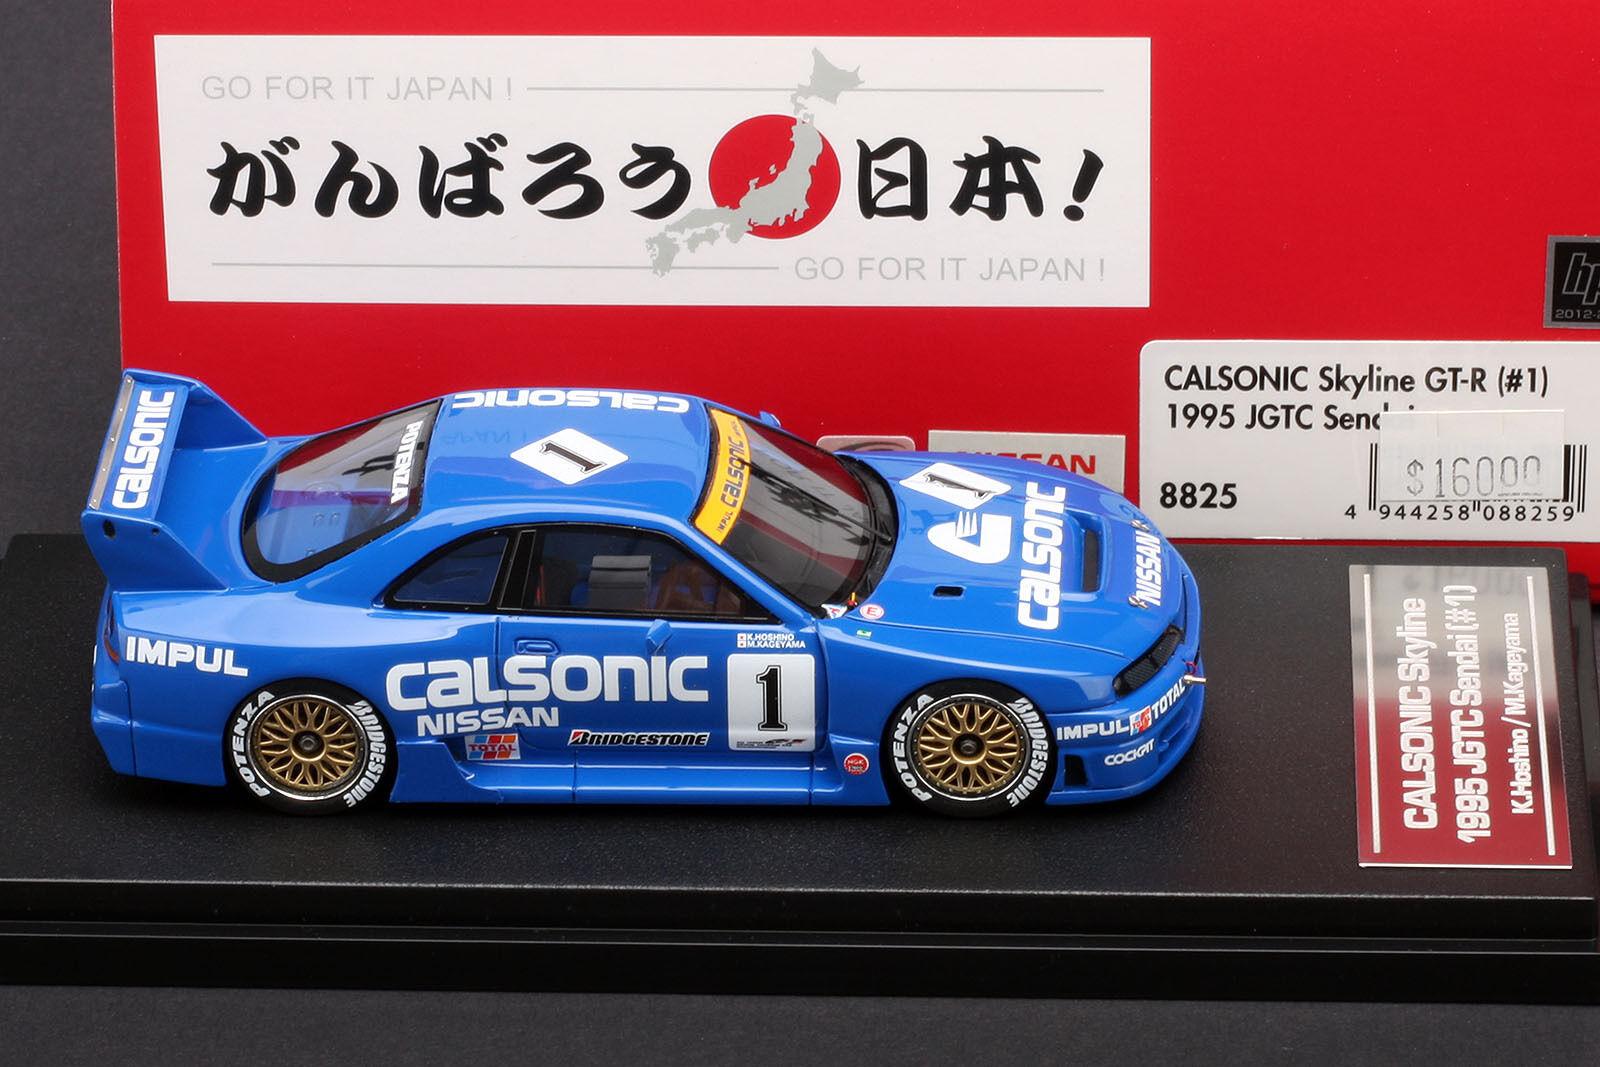 Den sista CALSONIC SKYLINE GT -R JGTC SENDAI hkonsts, HPI  43